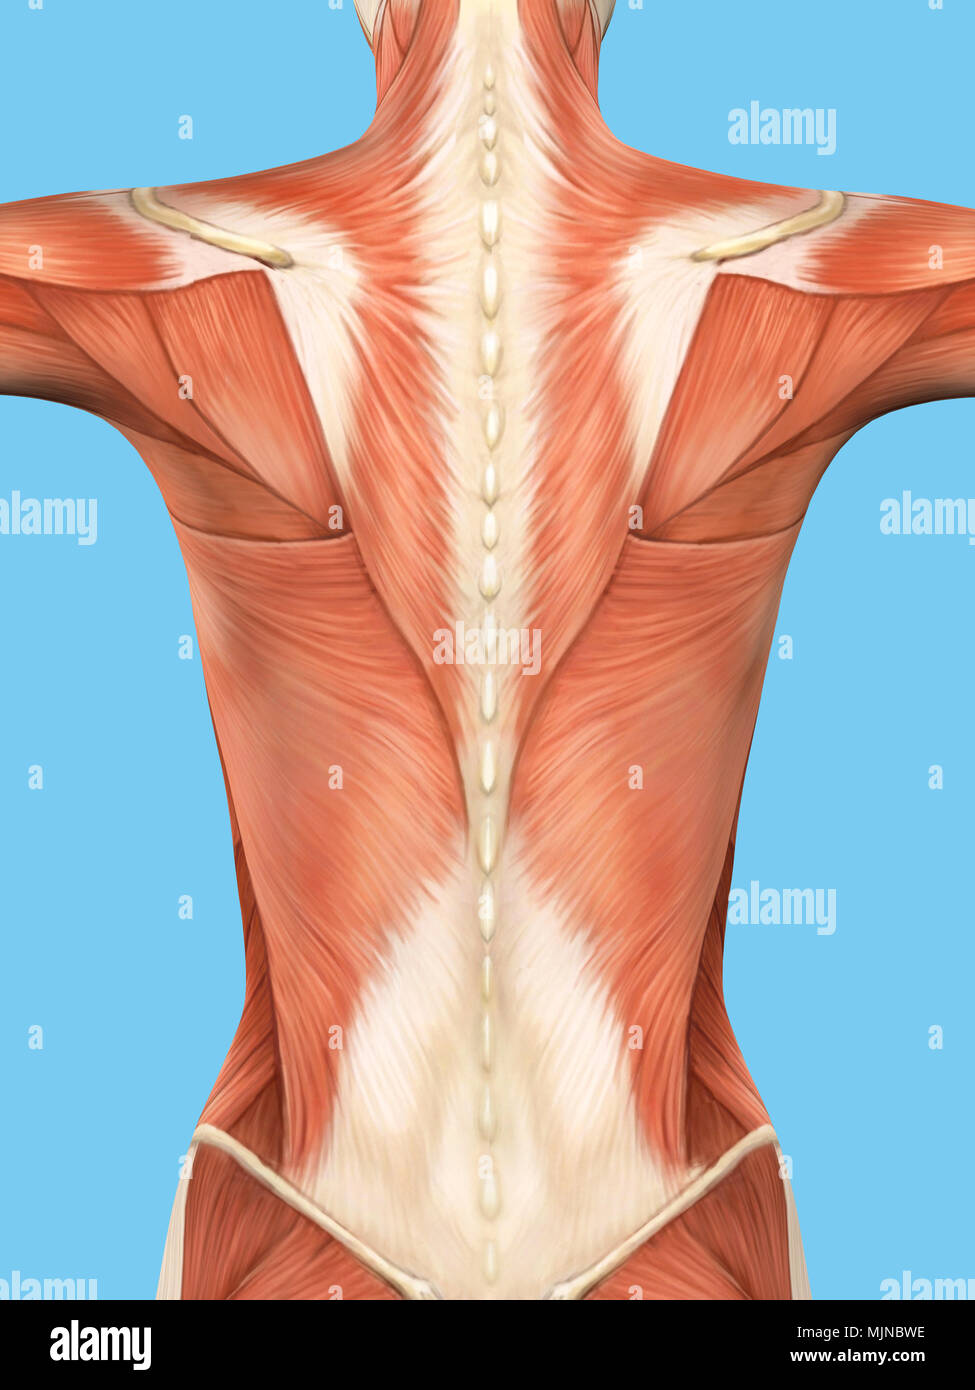 Anatomie der Zurück Stockfoto, Bild: 183637818 - Alamy